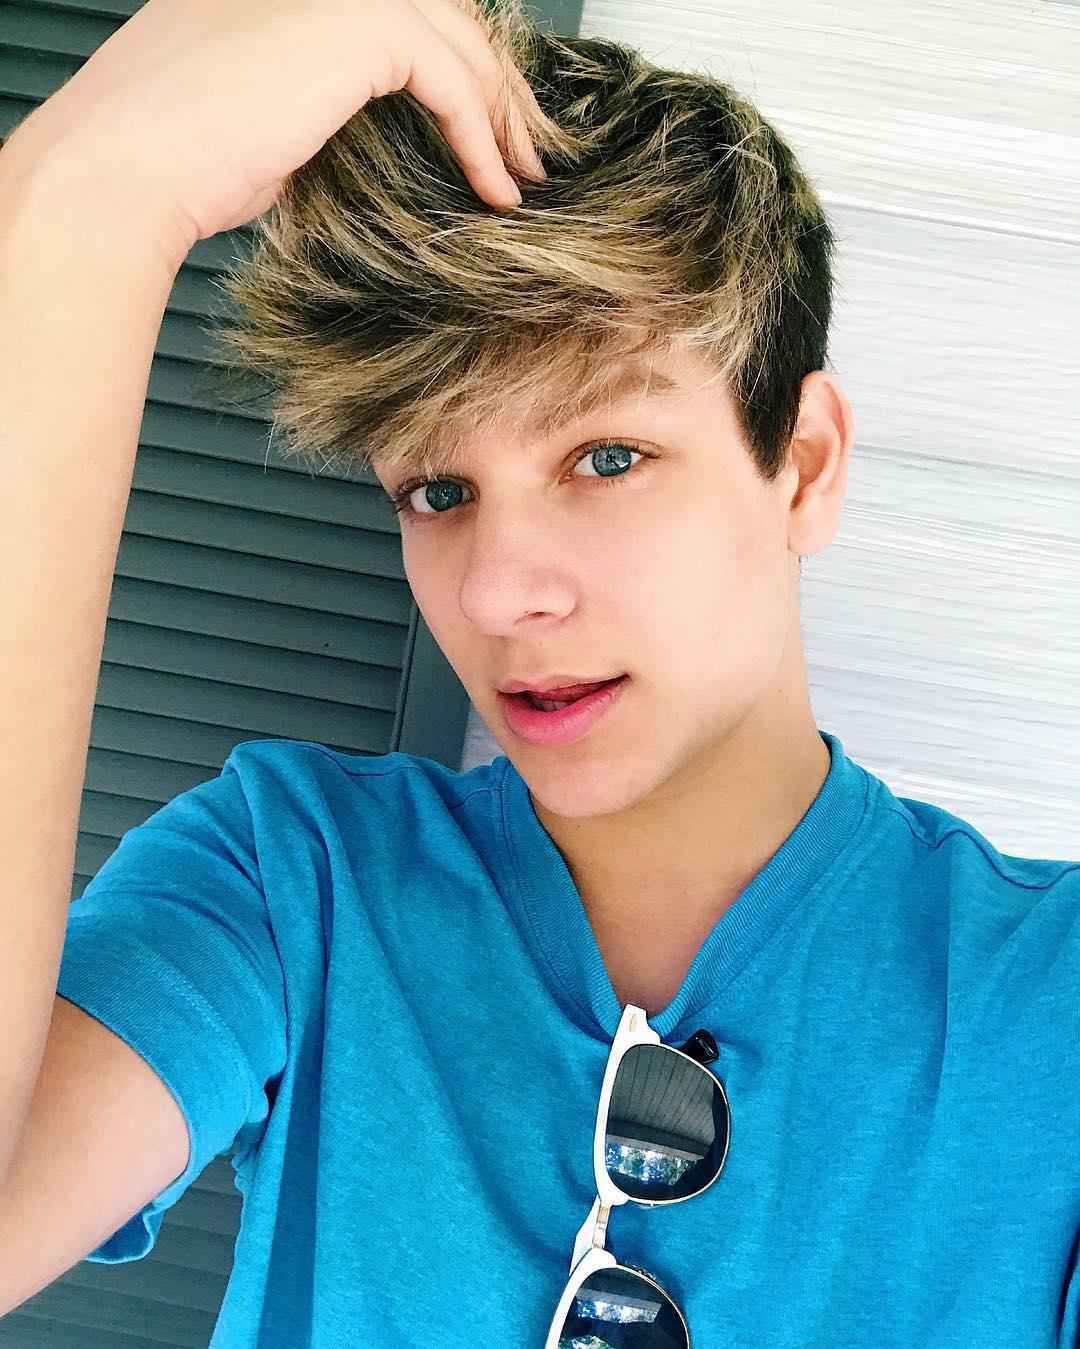 Nathan Triska Instagram username